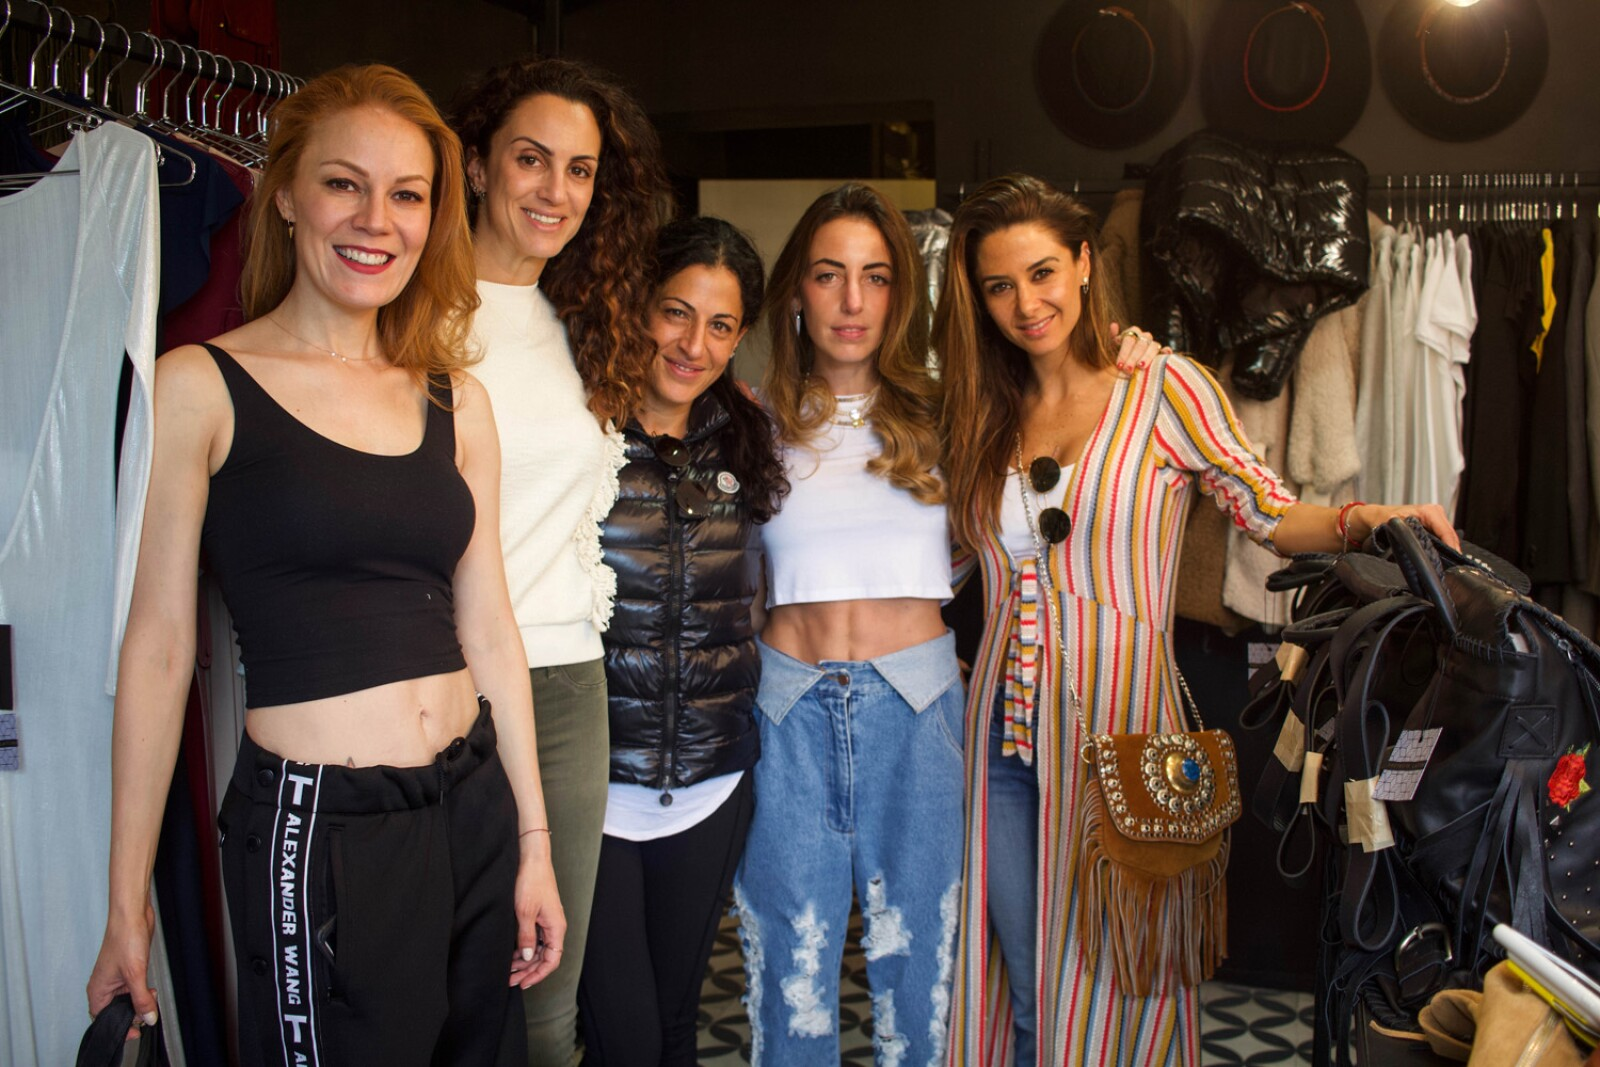 Daniela Magun, Estrella Jafif, Becky Cohen, Vanessa Atti y Celia Abadi.jpg